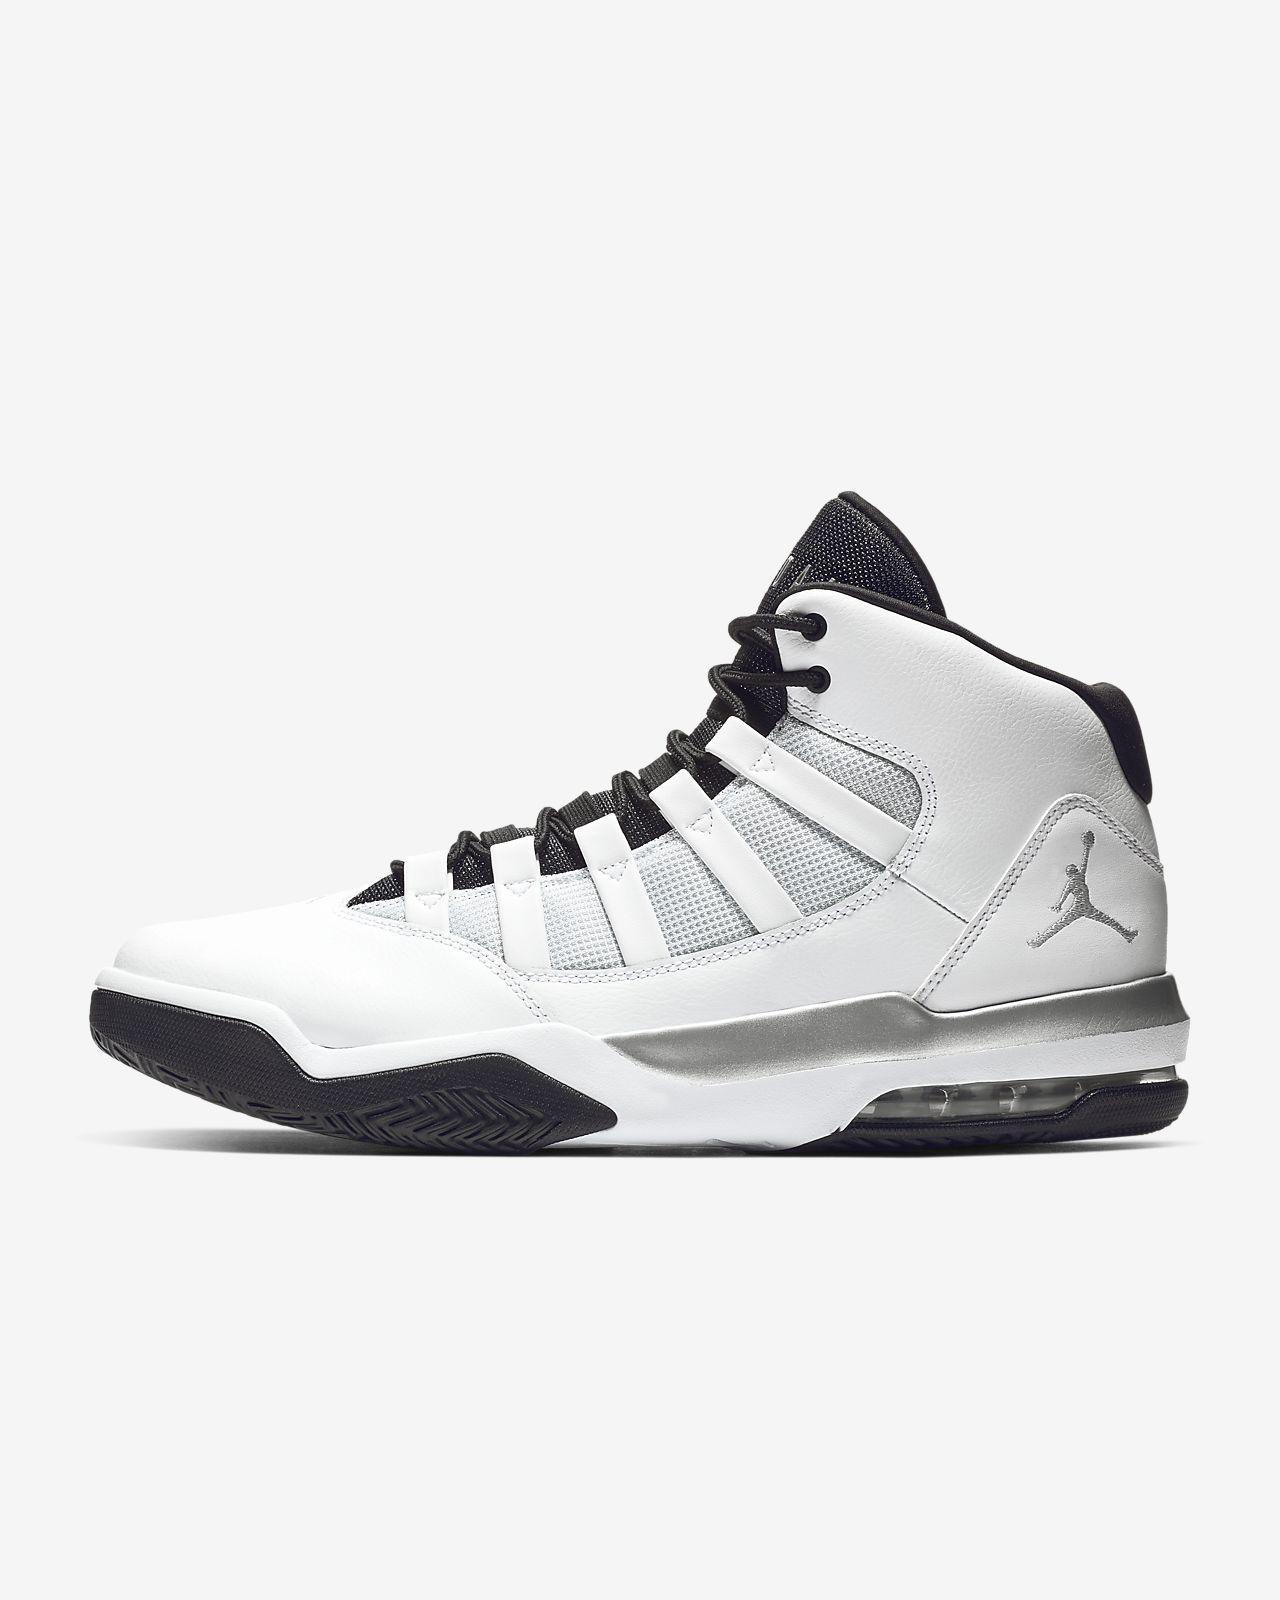 a05e3cc4edb Jordan Max Aura Men's Basketball Shoe. Nike.com